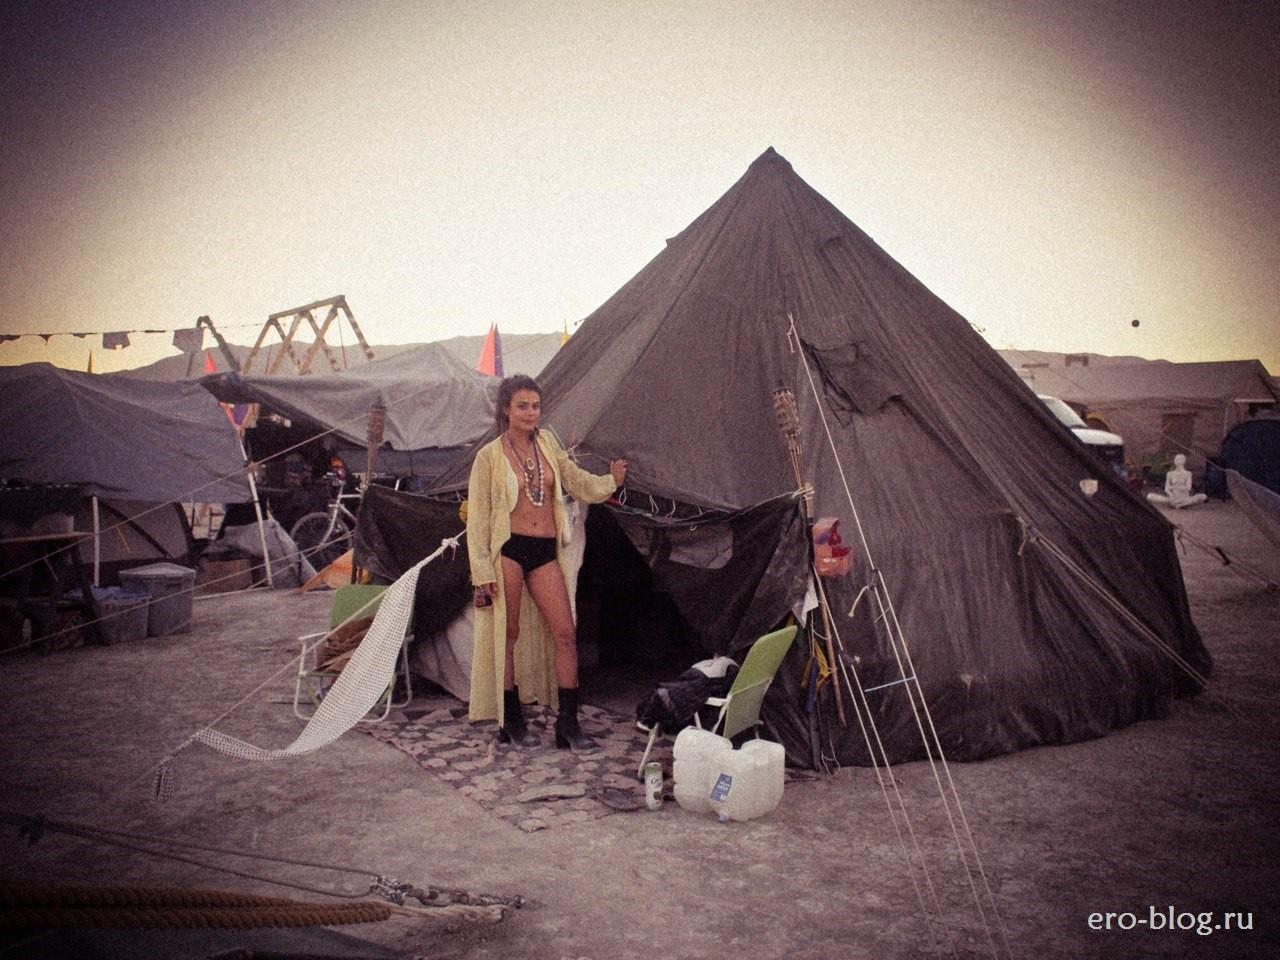 Голая обнаженная Nathalie Kelley | Натали Келли интимные фото звезды